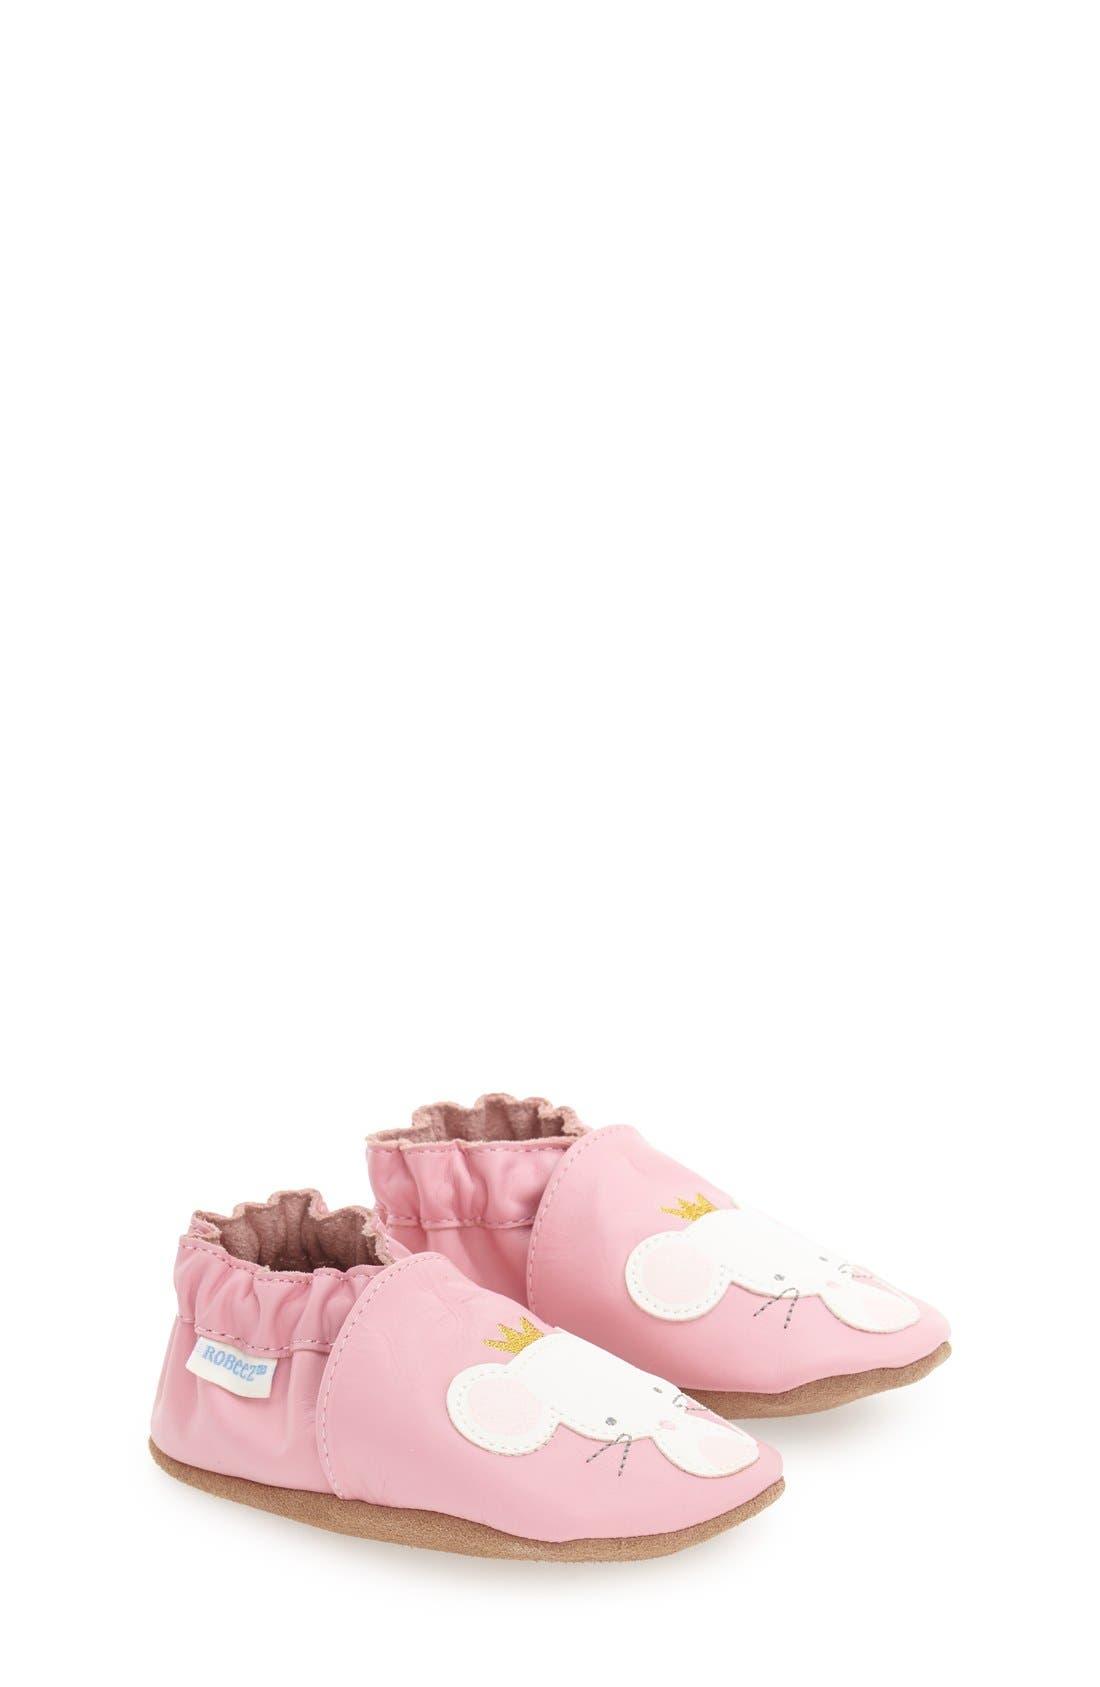 'Princess' Crib Shoe,                         Main,                         color, Prism Pink Leather